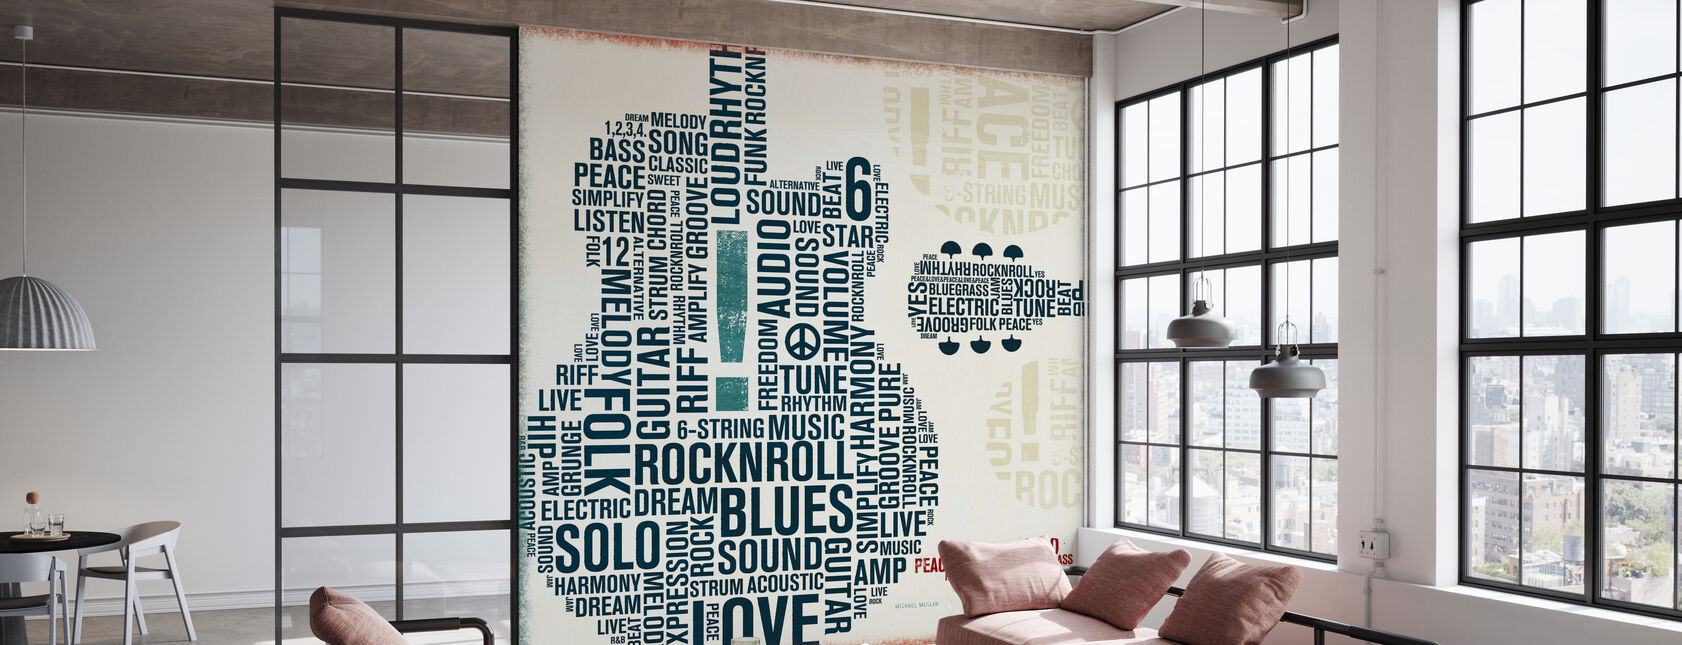 Type Guitar Square II - Wallpaper - Office